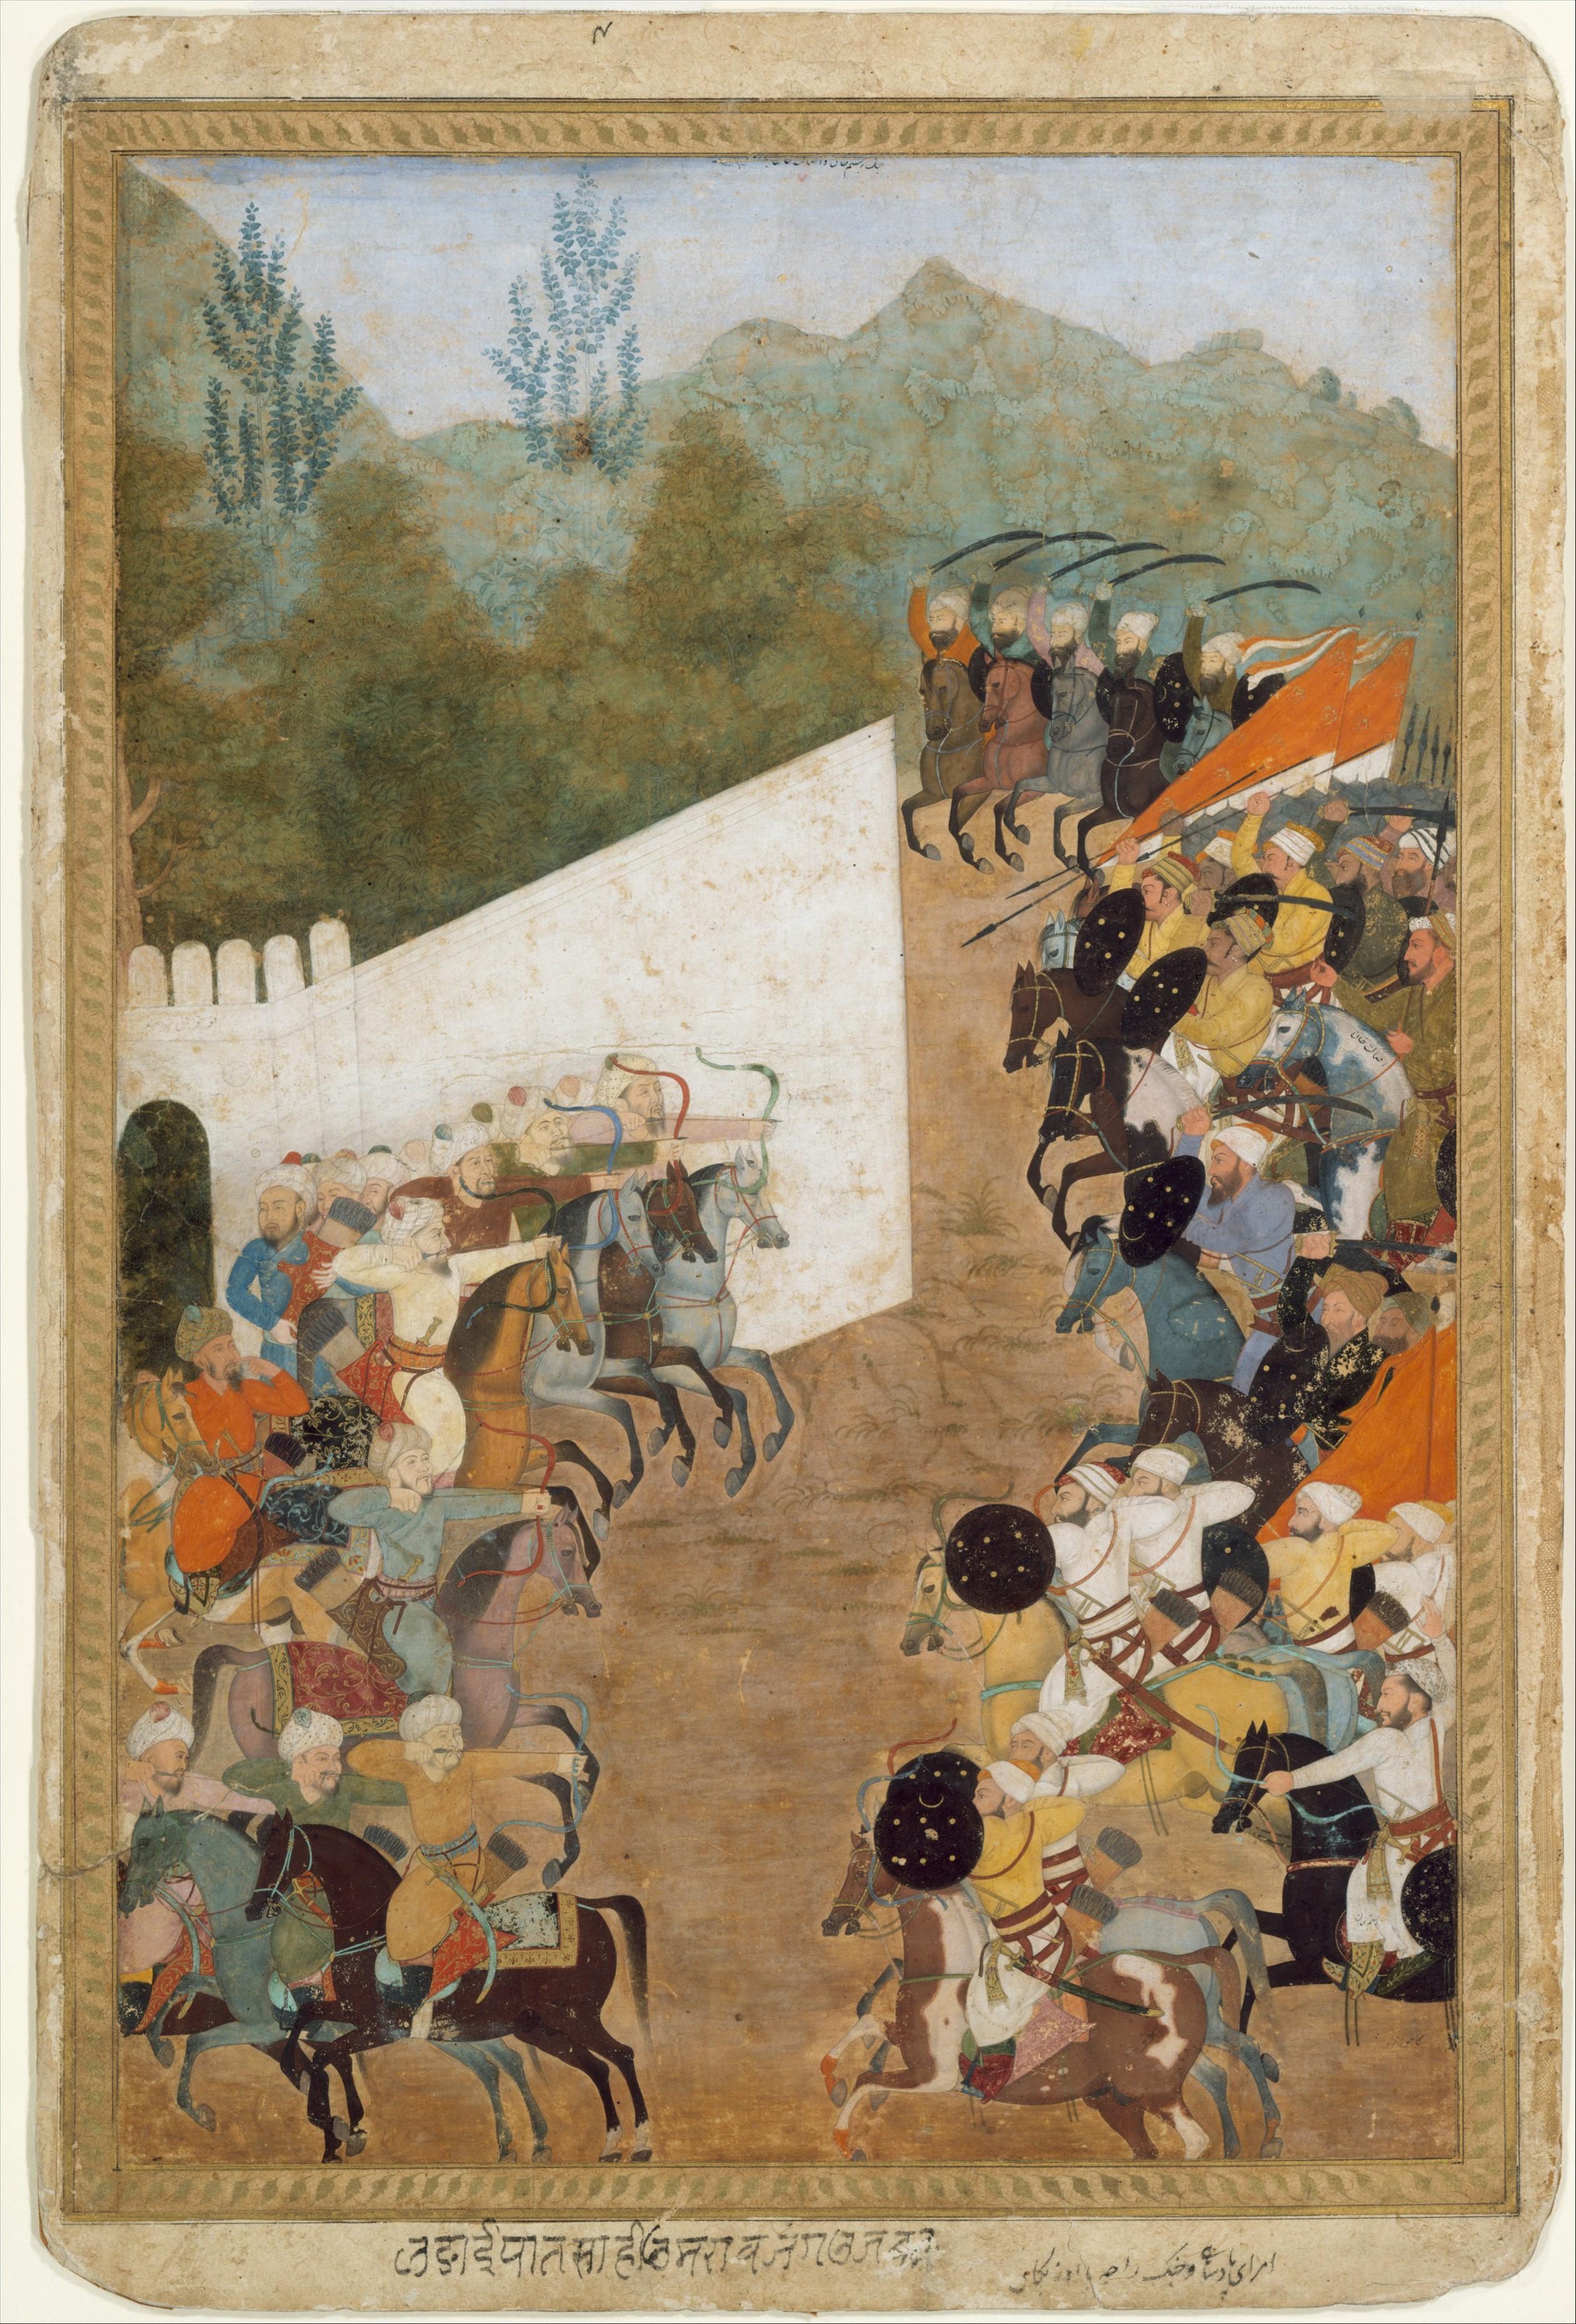 The Battle of Shahbarghan, illustration of Padshahnama by Abdul Hamid Lahori, 1646-1700, Mughal Empire